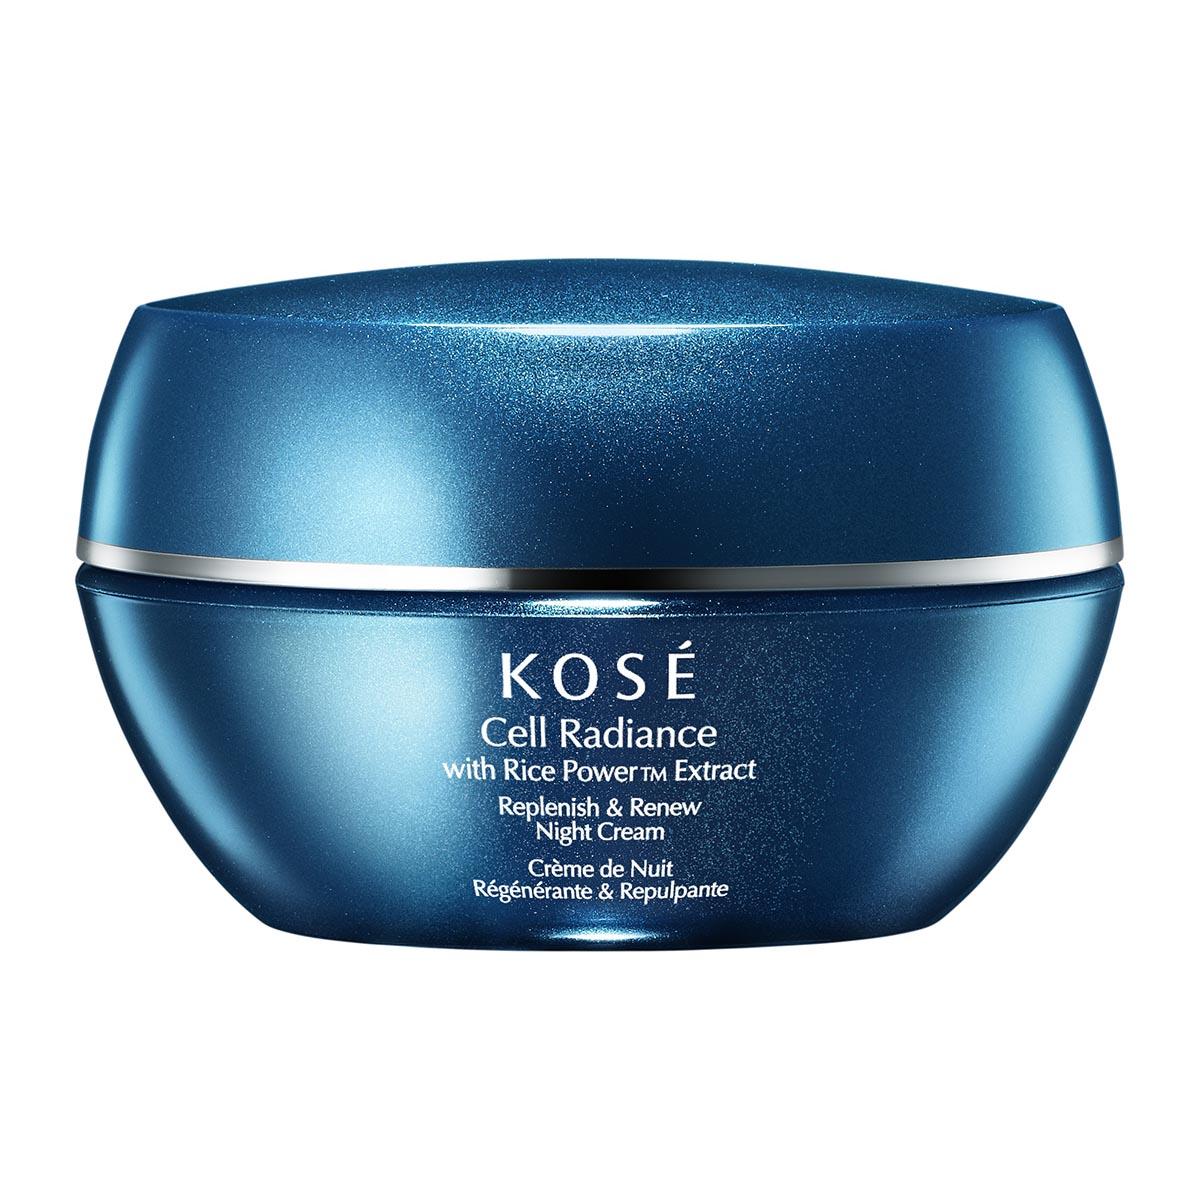 Kose cell radiance with rice powertm extract replenish renew night cream 40ml